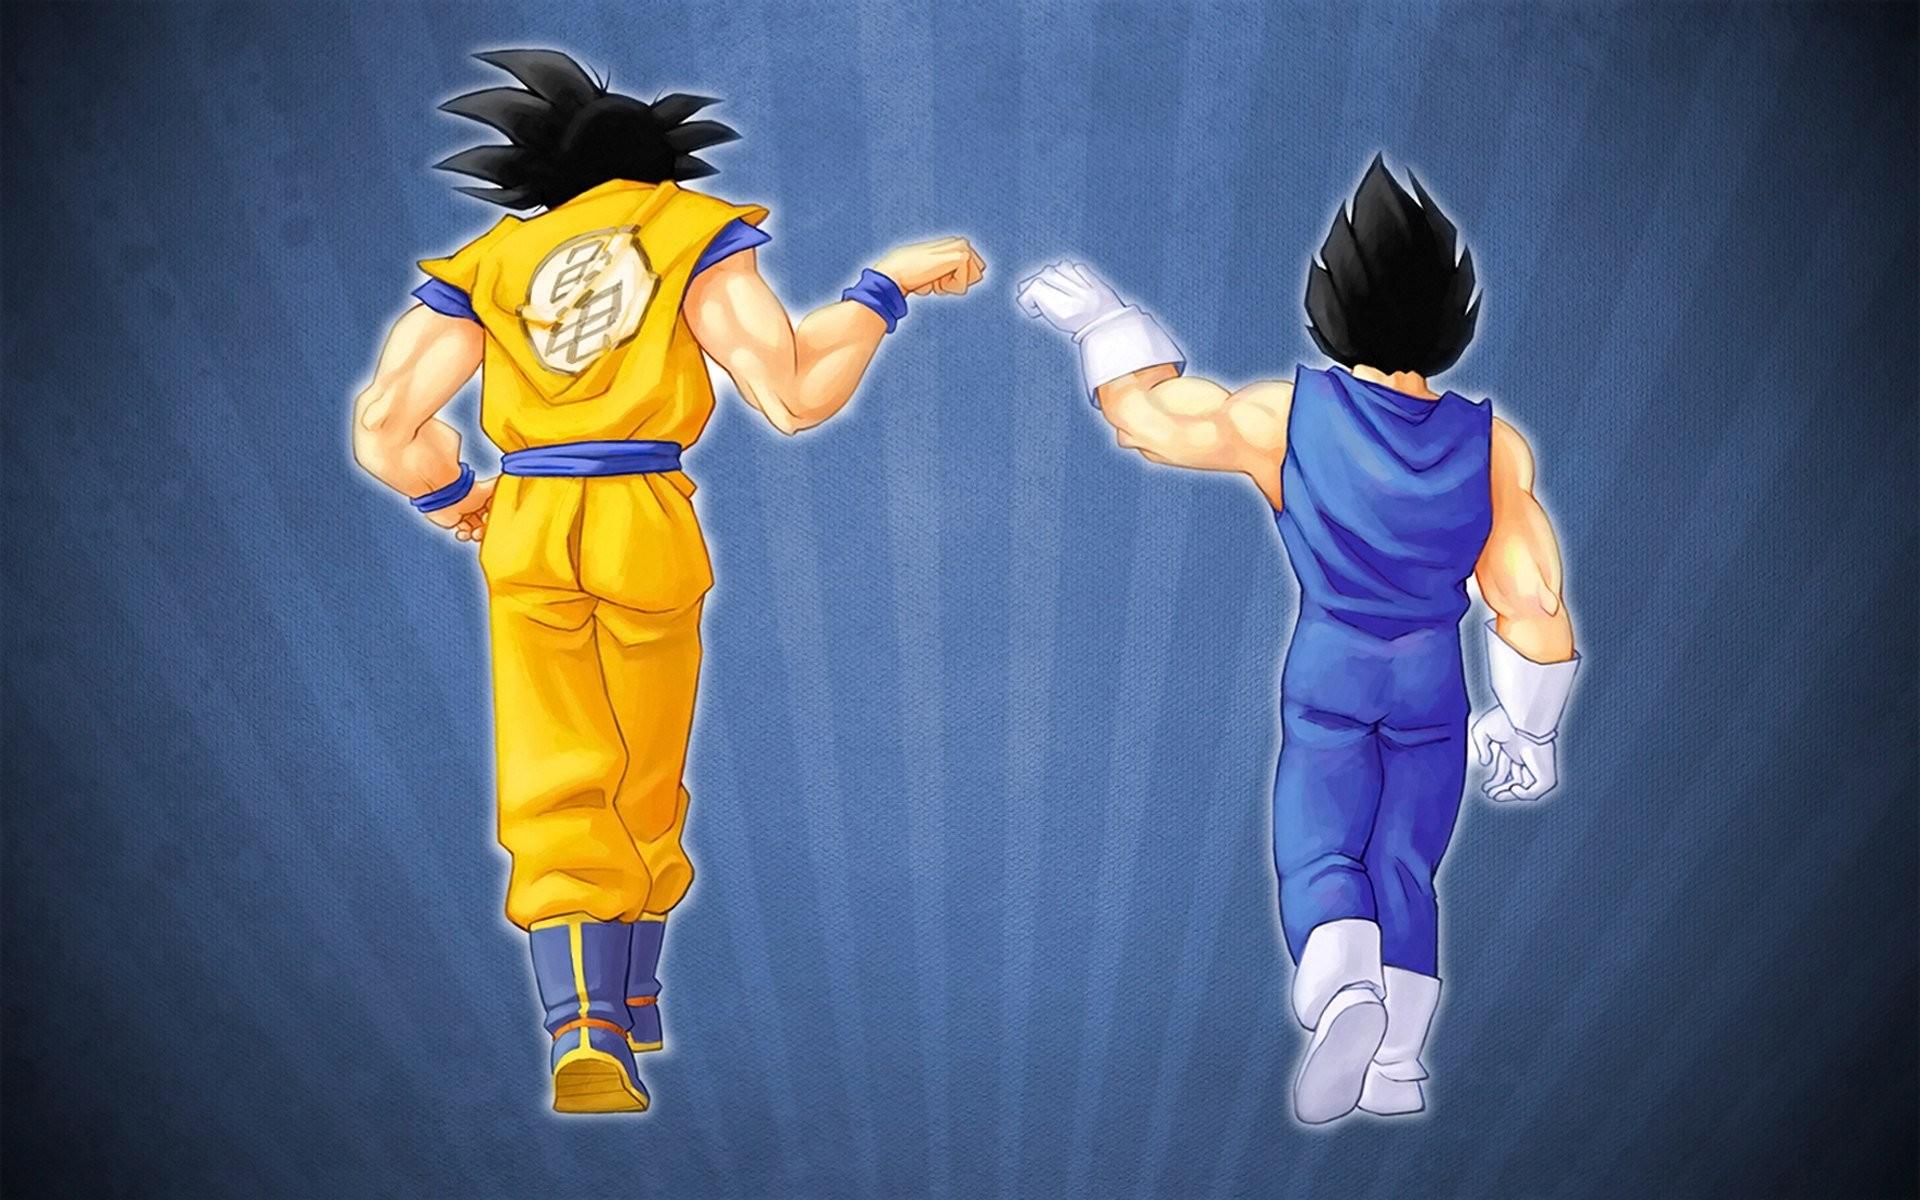 Dragonball Z Vegeta Son Goku wallpaper